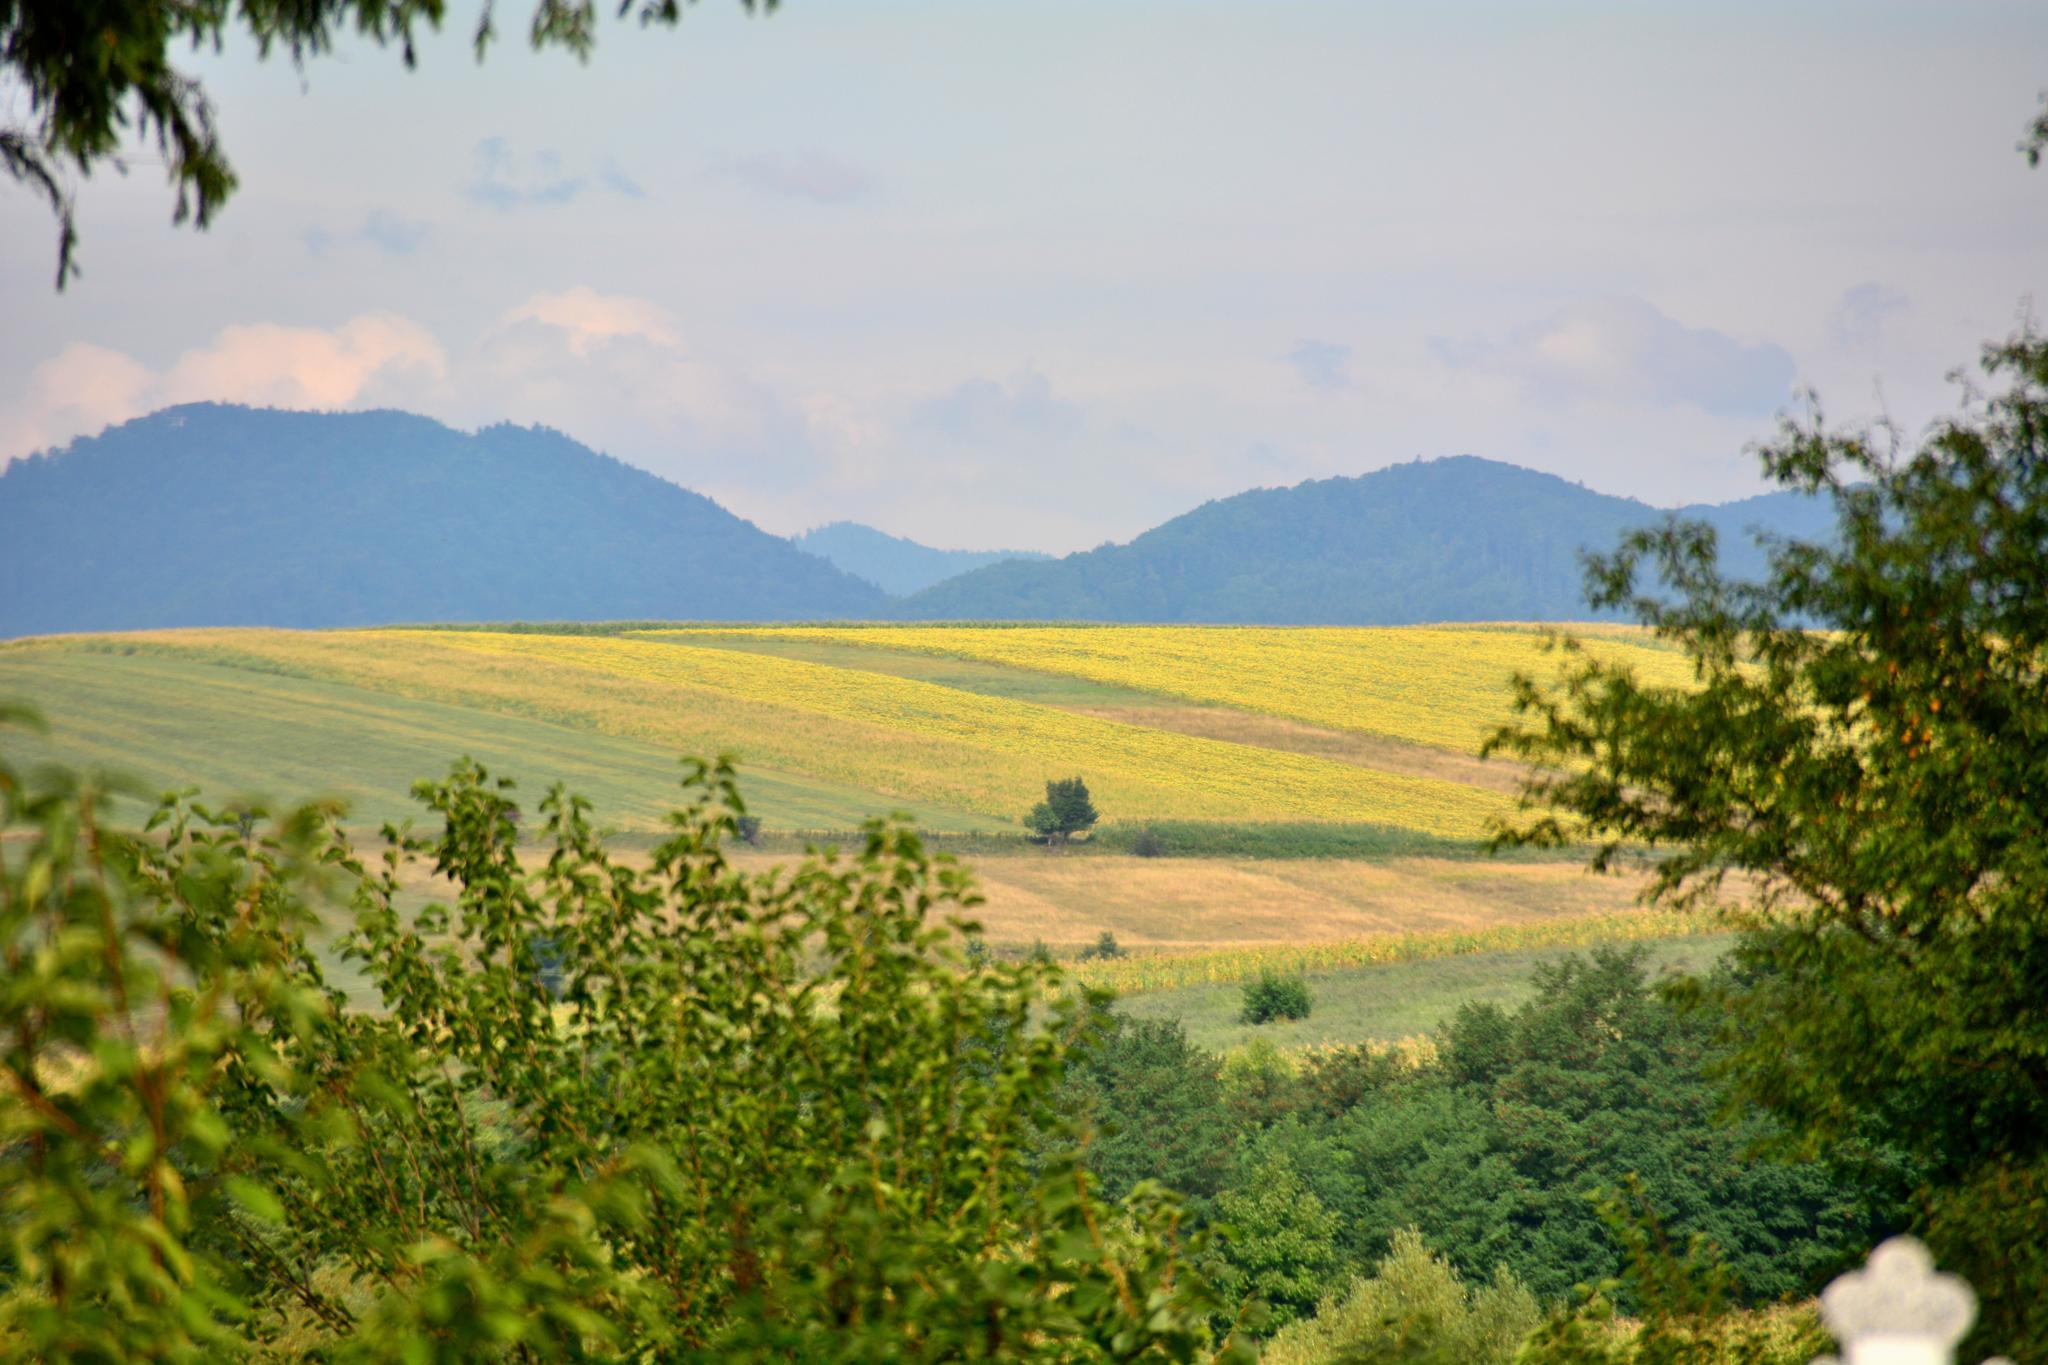 Landscape by Silviu Calistru